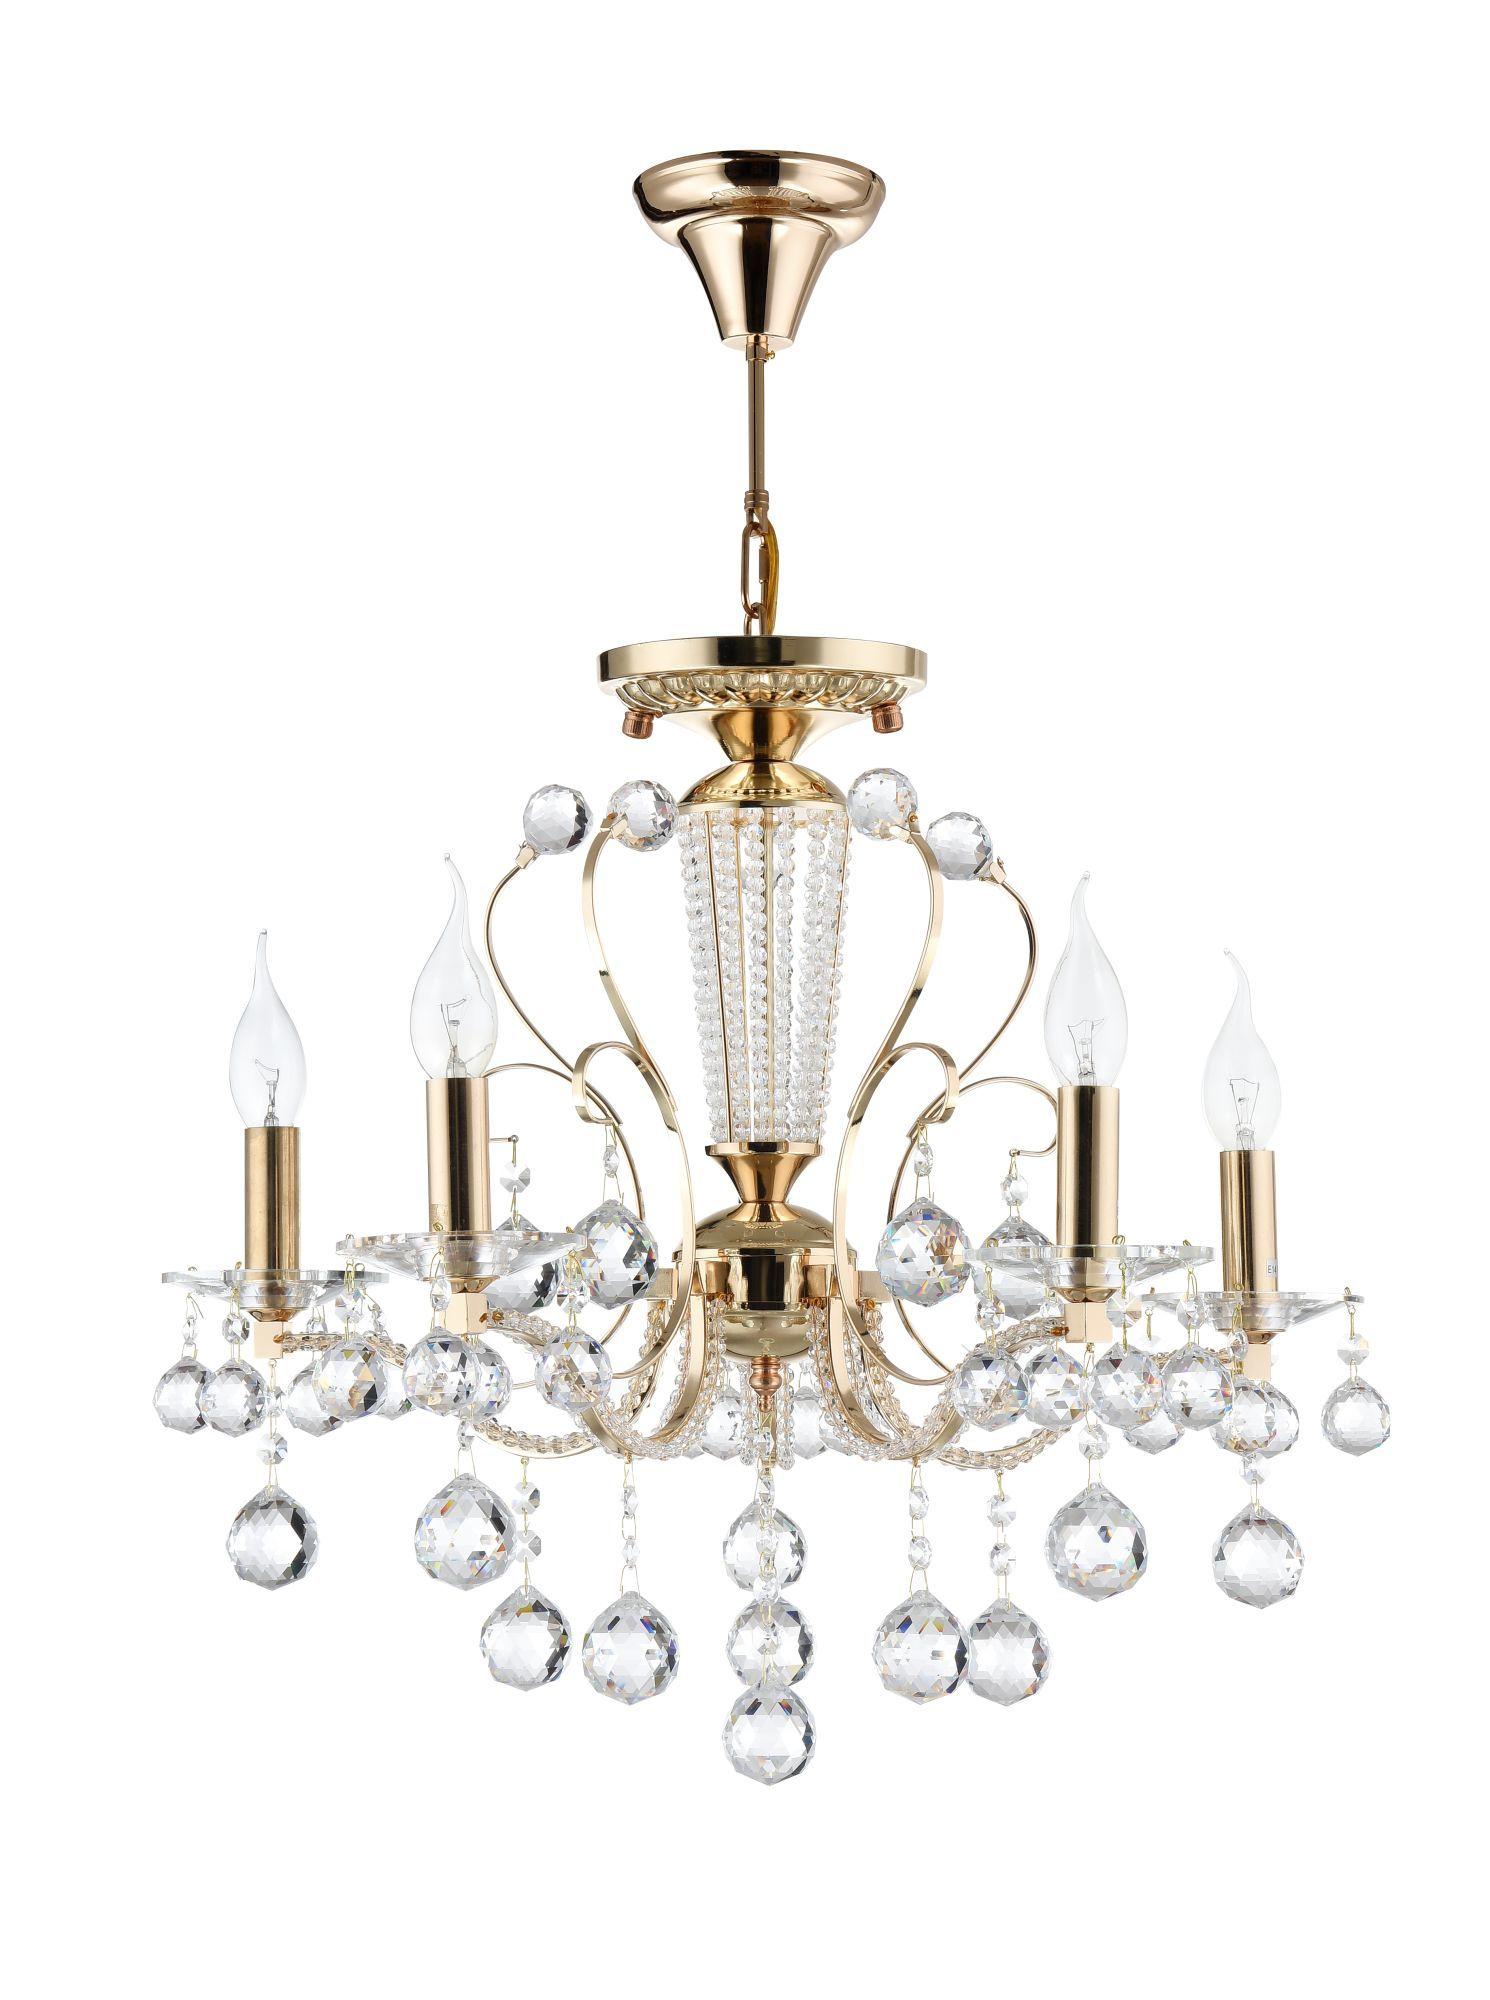 Потолочно-подвесная люстра Freya Marlin FR1130-PL-05-G (FR130-05-G), 5xE14x40W, золото с прозрачным, прозрачный с золотом, прозрачный, металл со стеклом, хрусталь - фото 2